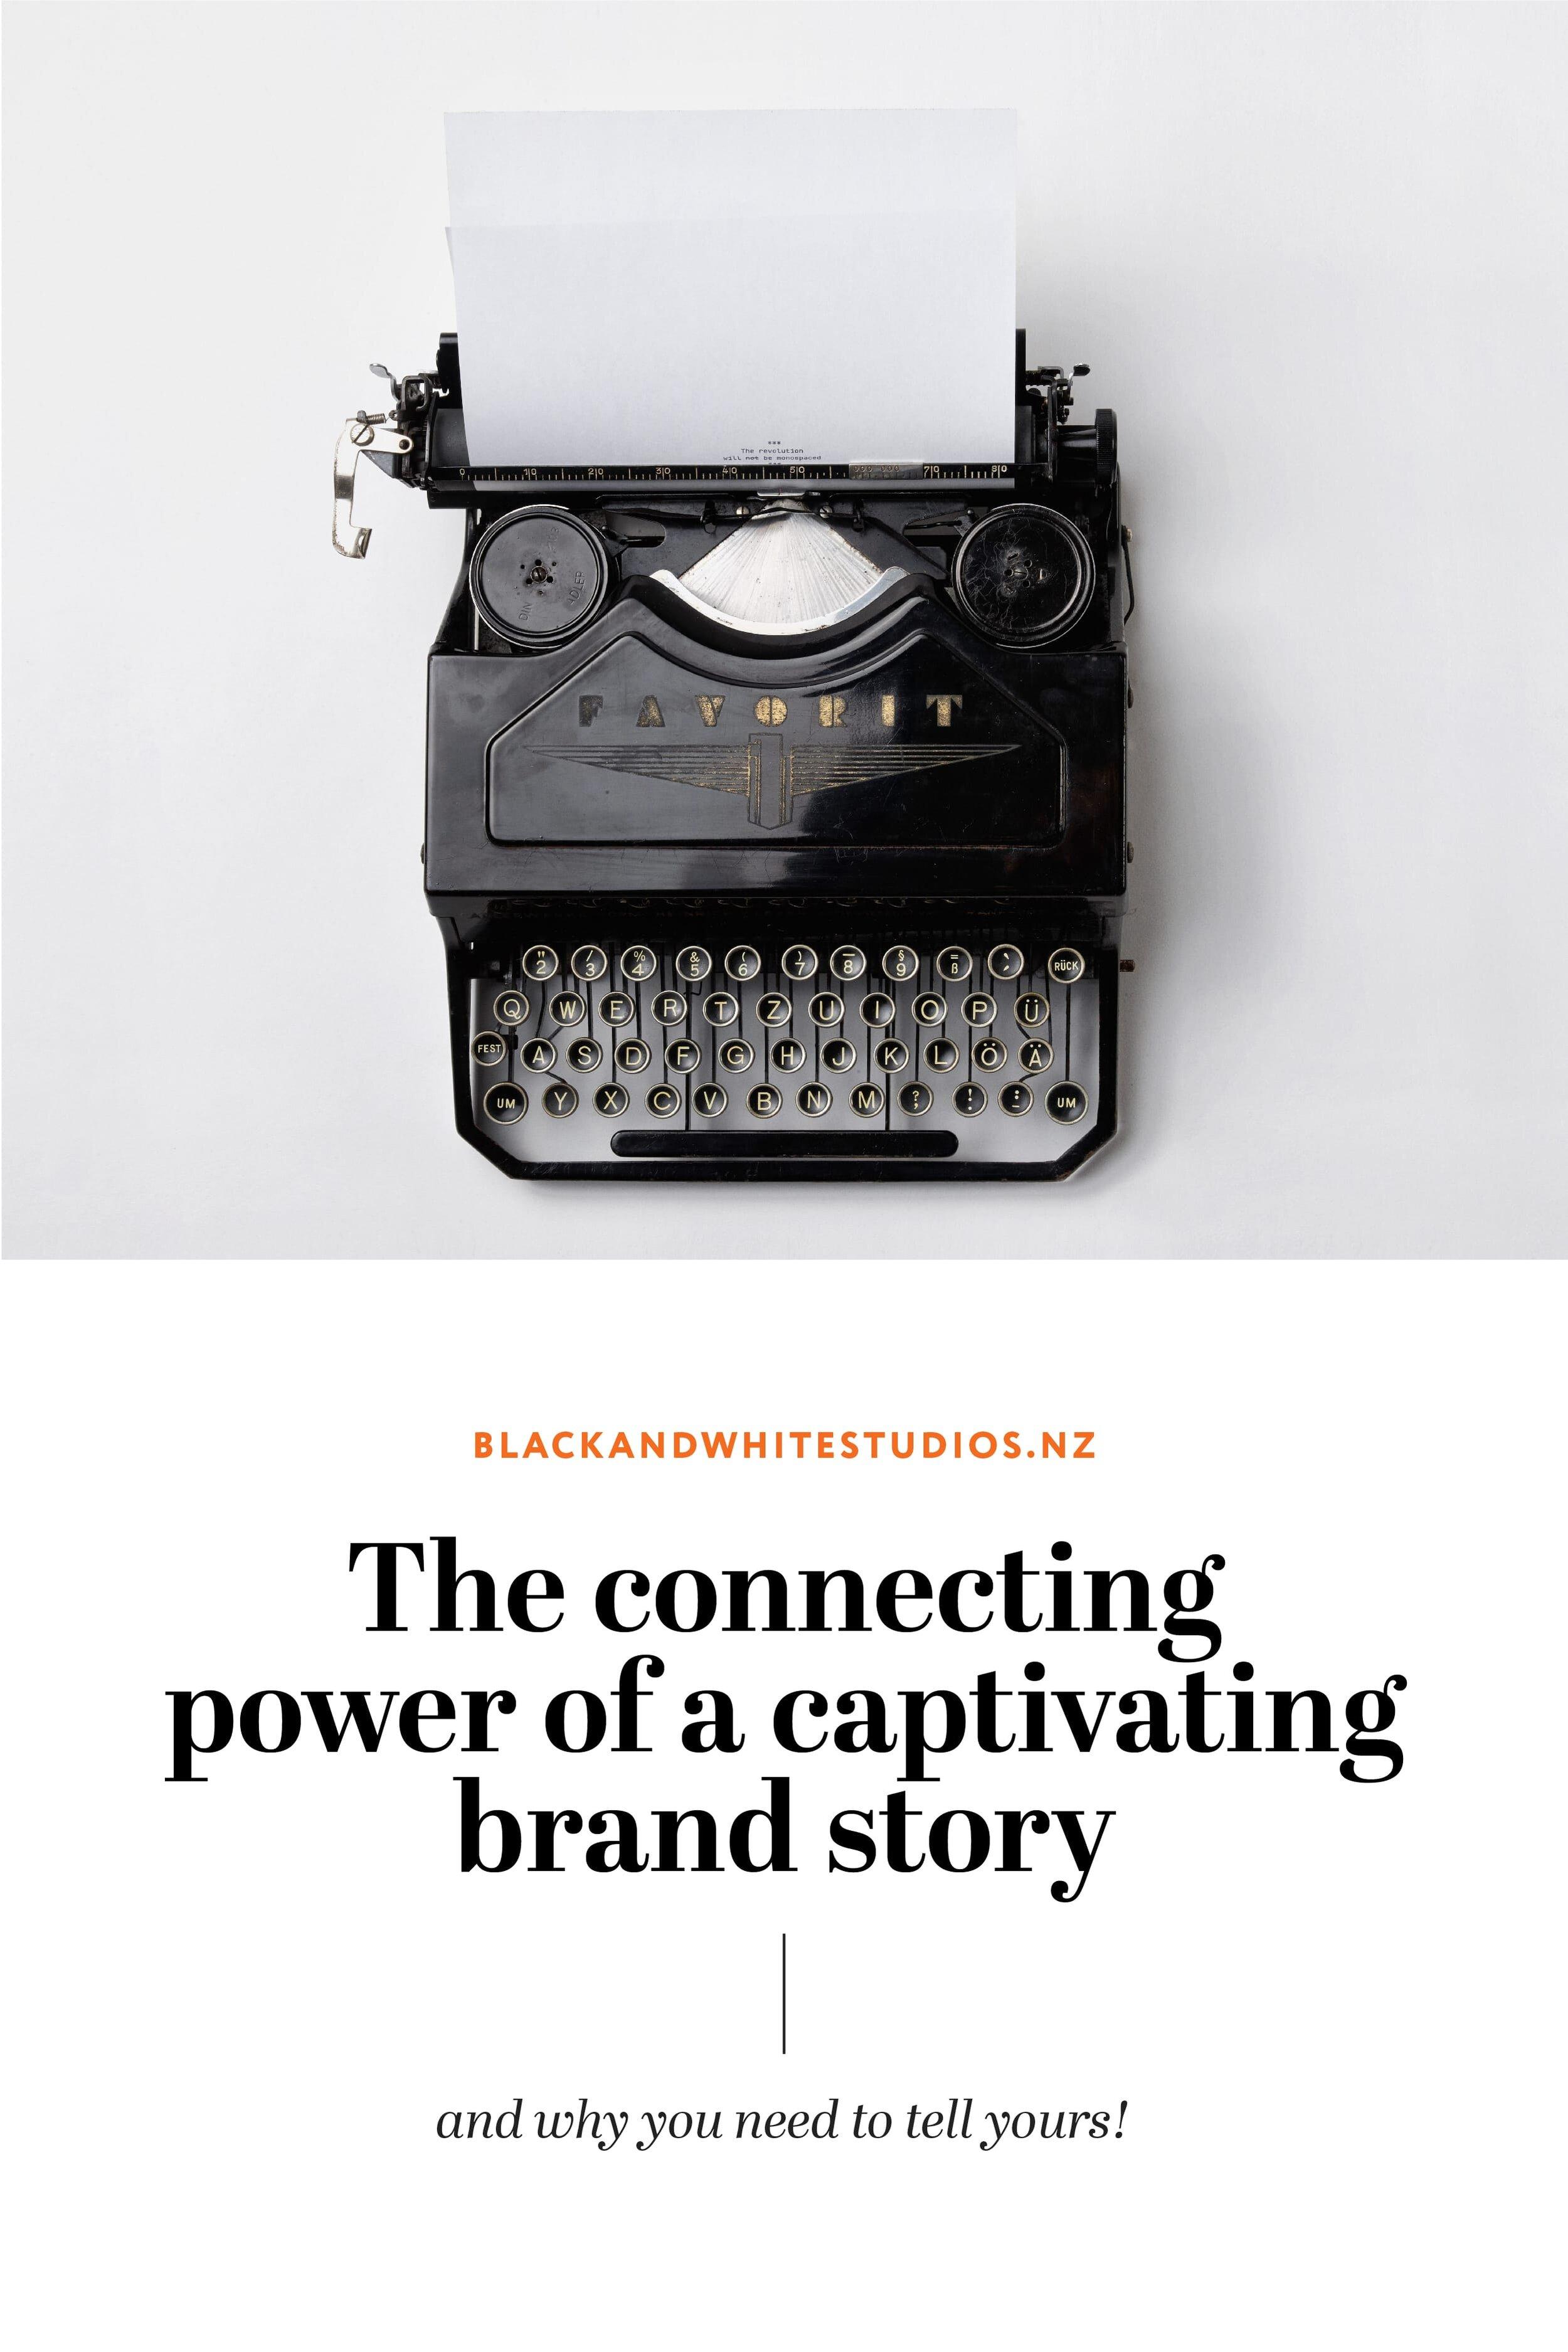 PINTEREST-brandstorypower.jpg